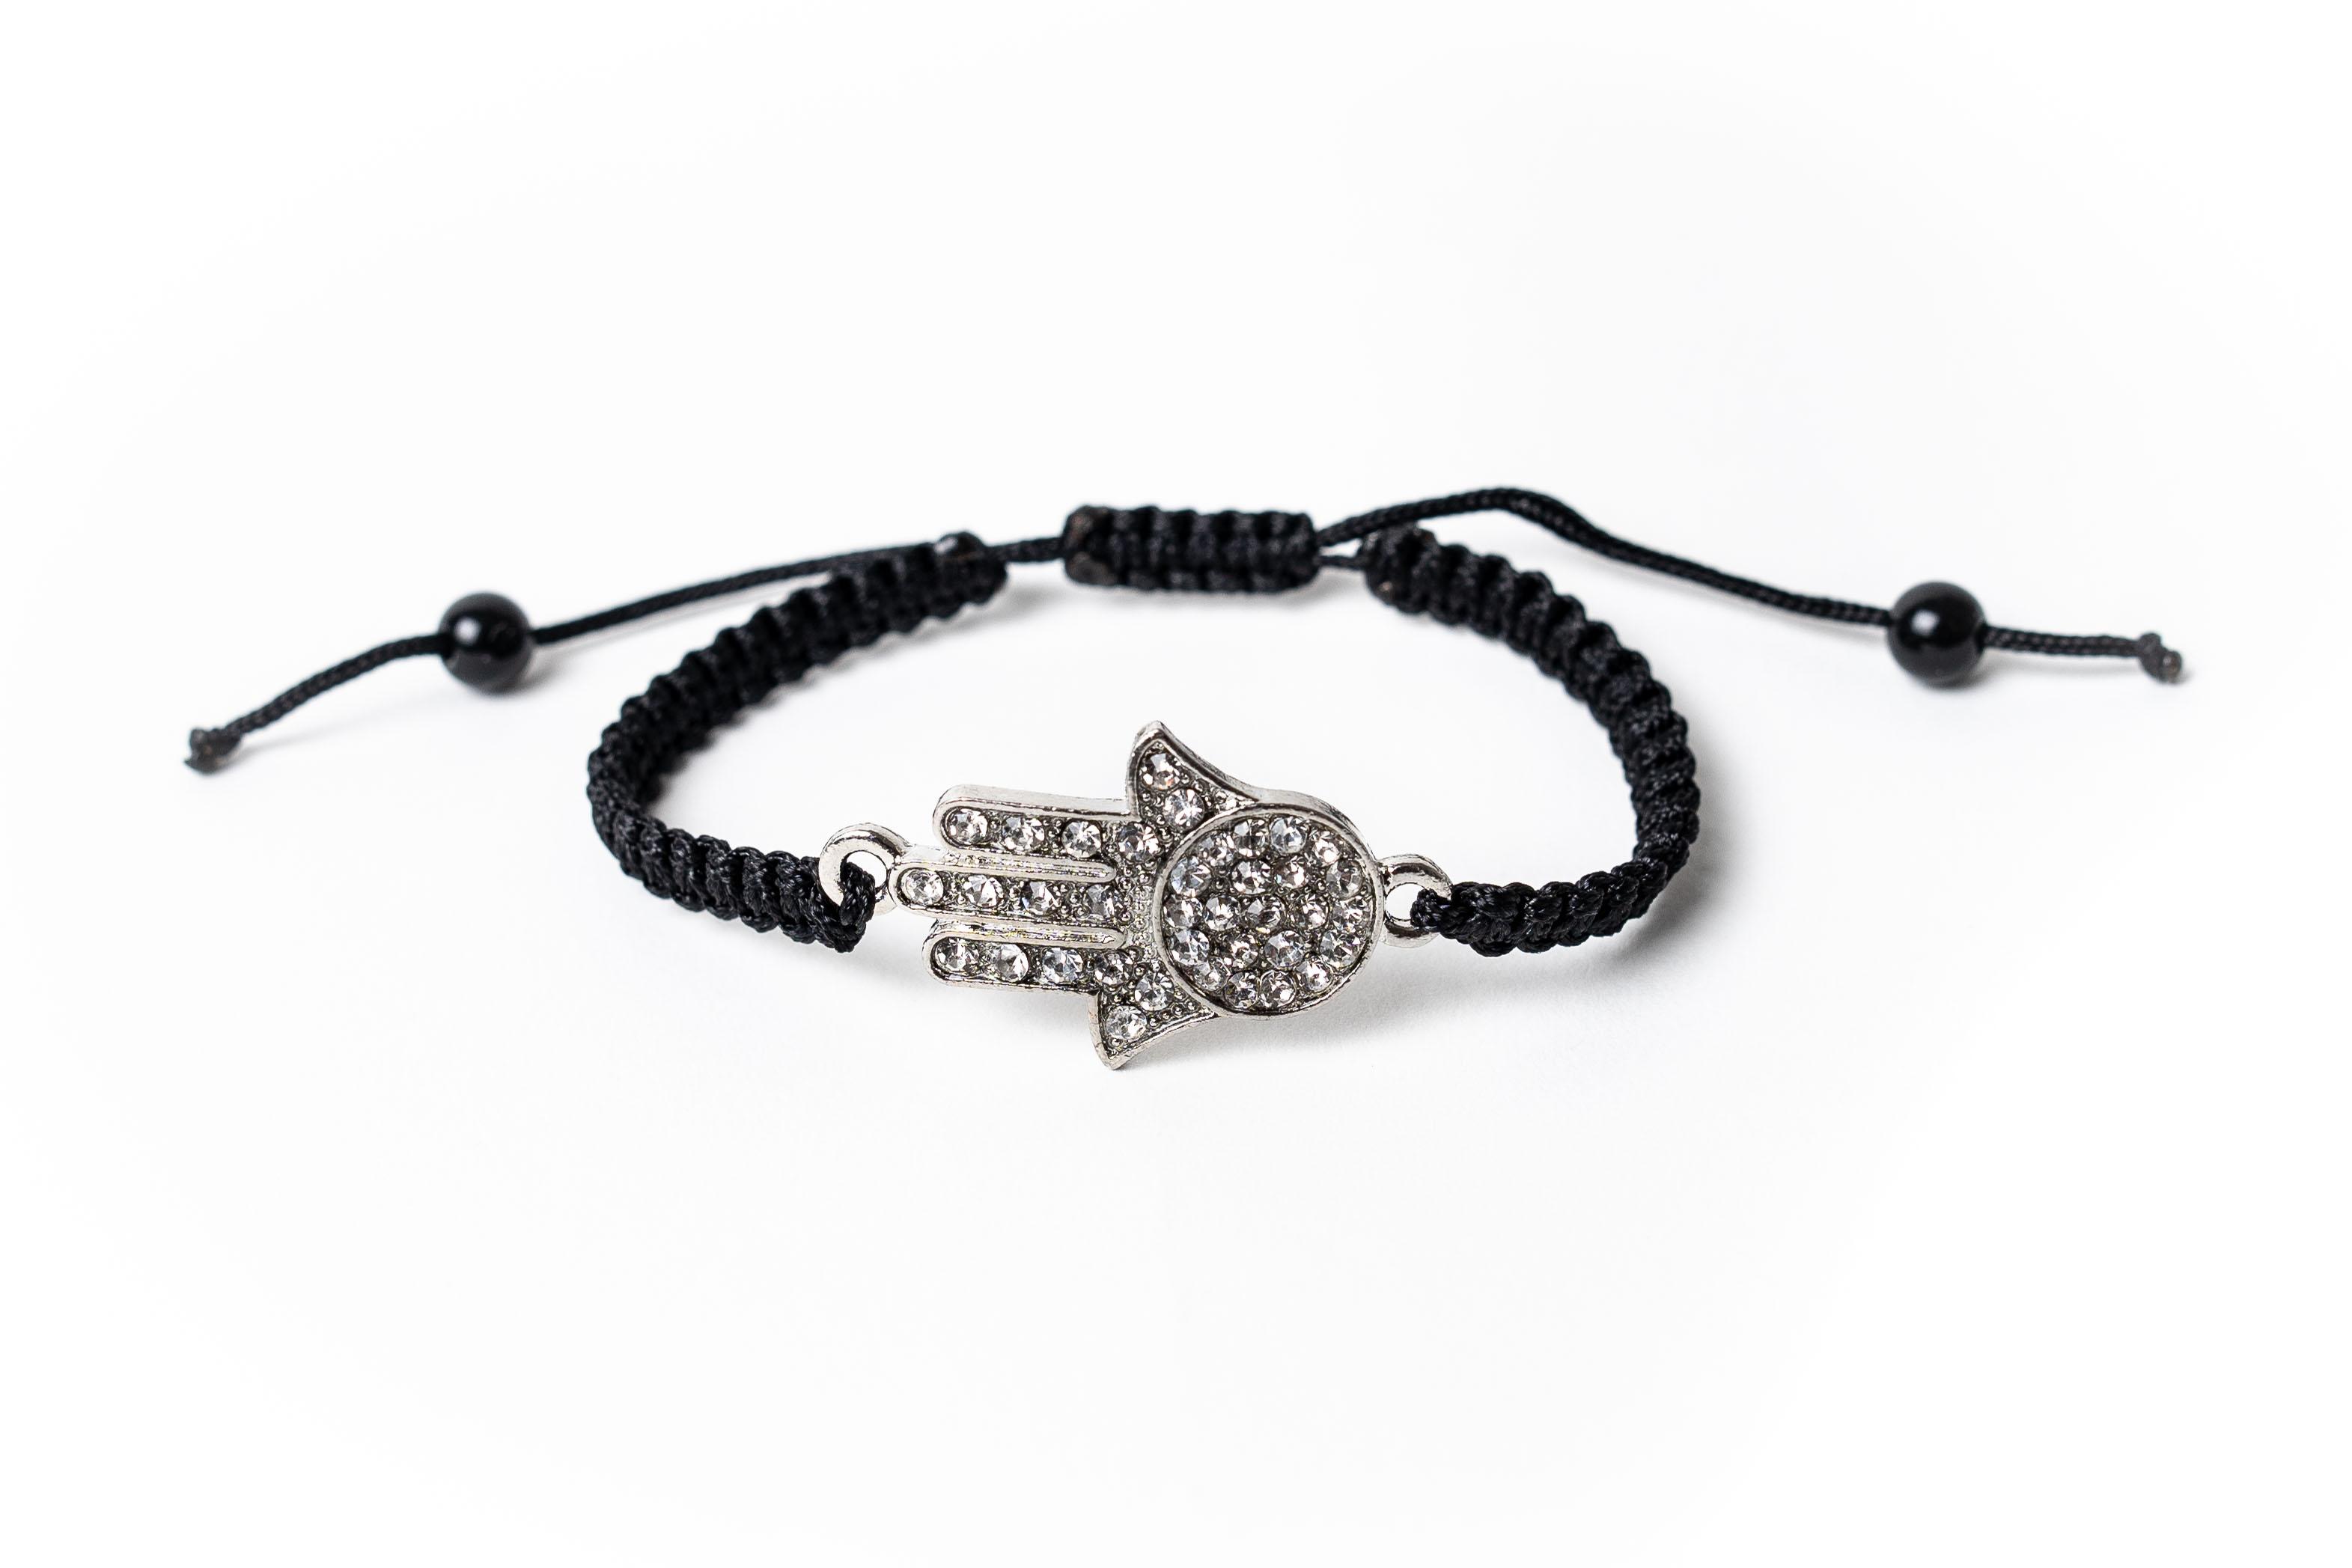 Macramé náramek hamsa s krystaly Černá, Pánský náramek